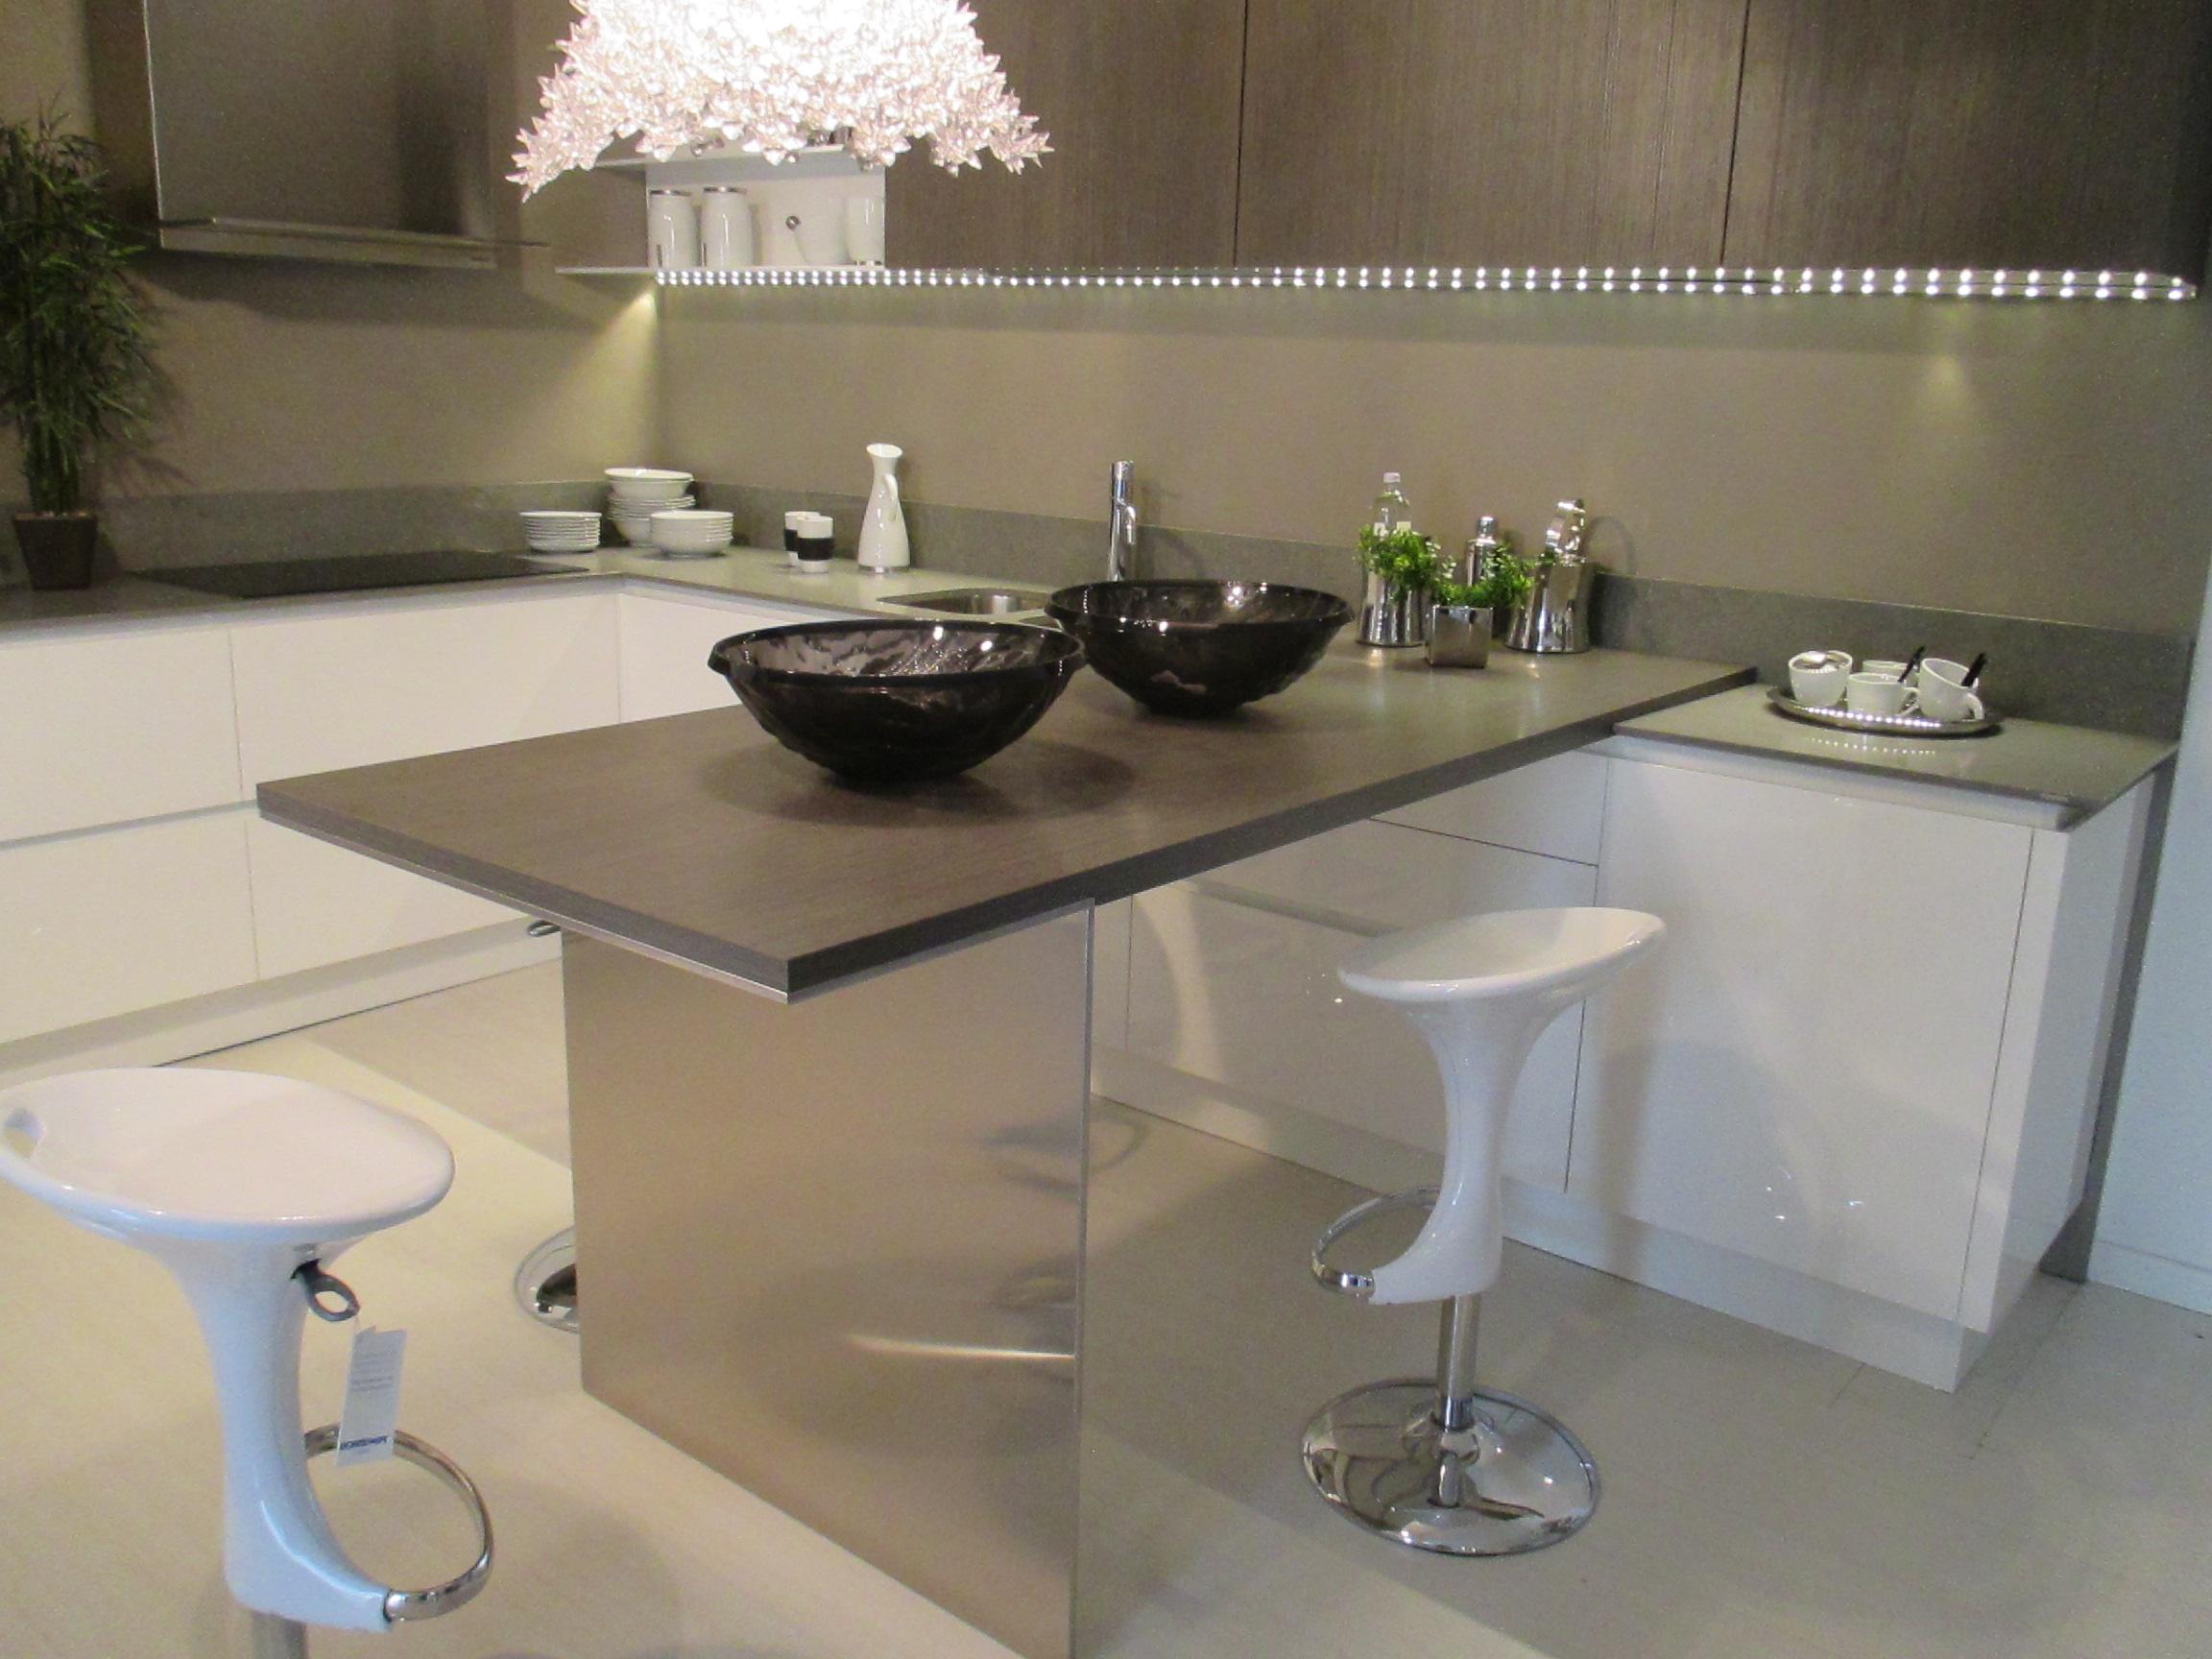 Ernestomeda cucina emetrica design laccato lucido bianca cucine a prezzi scontati - Cucina ernestomeda prezzi ...